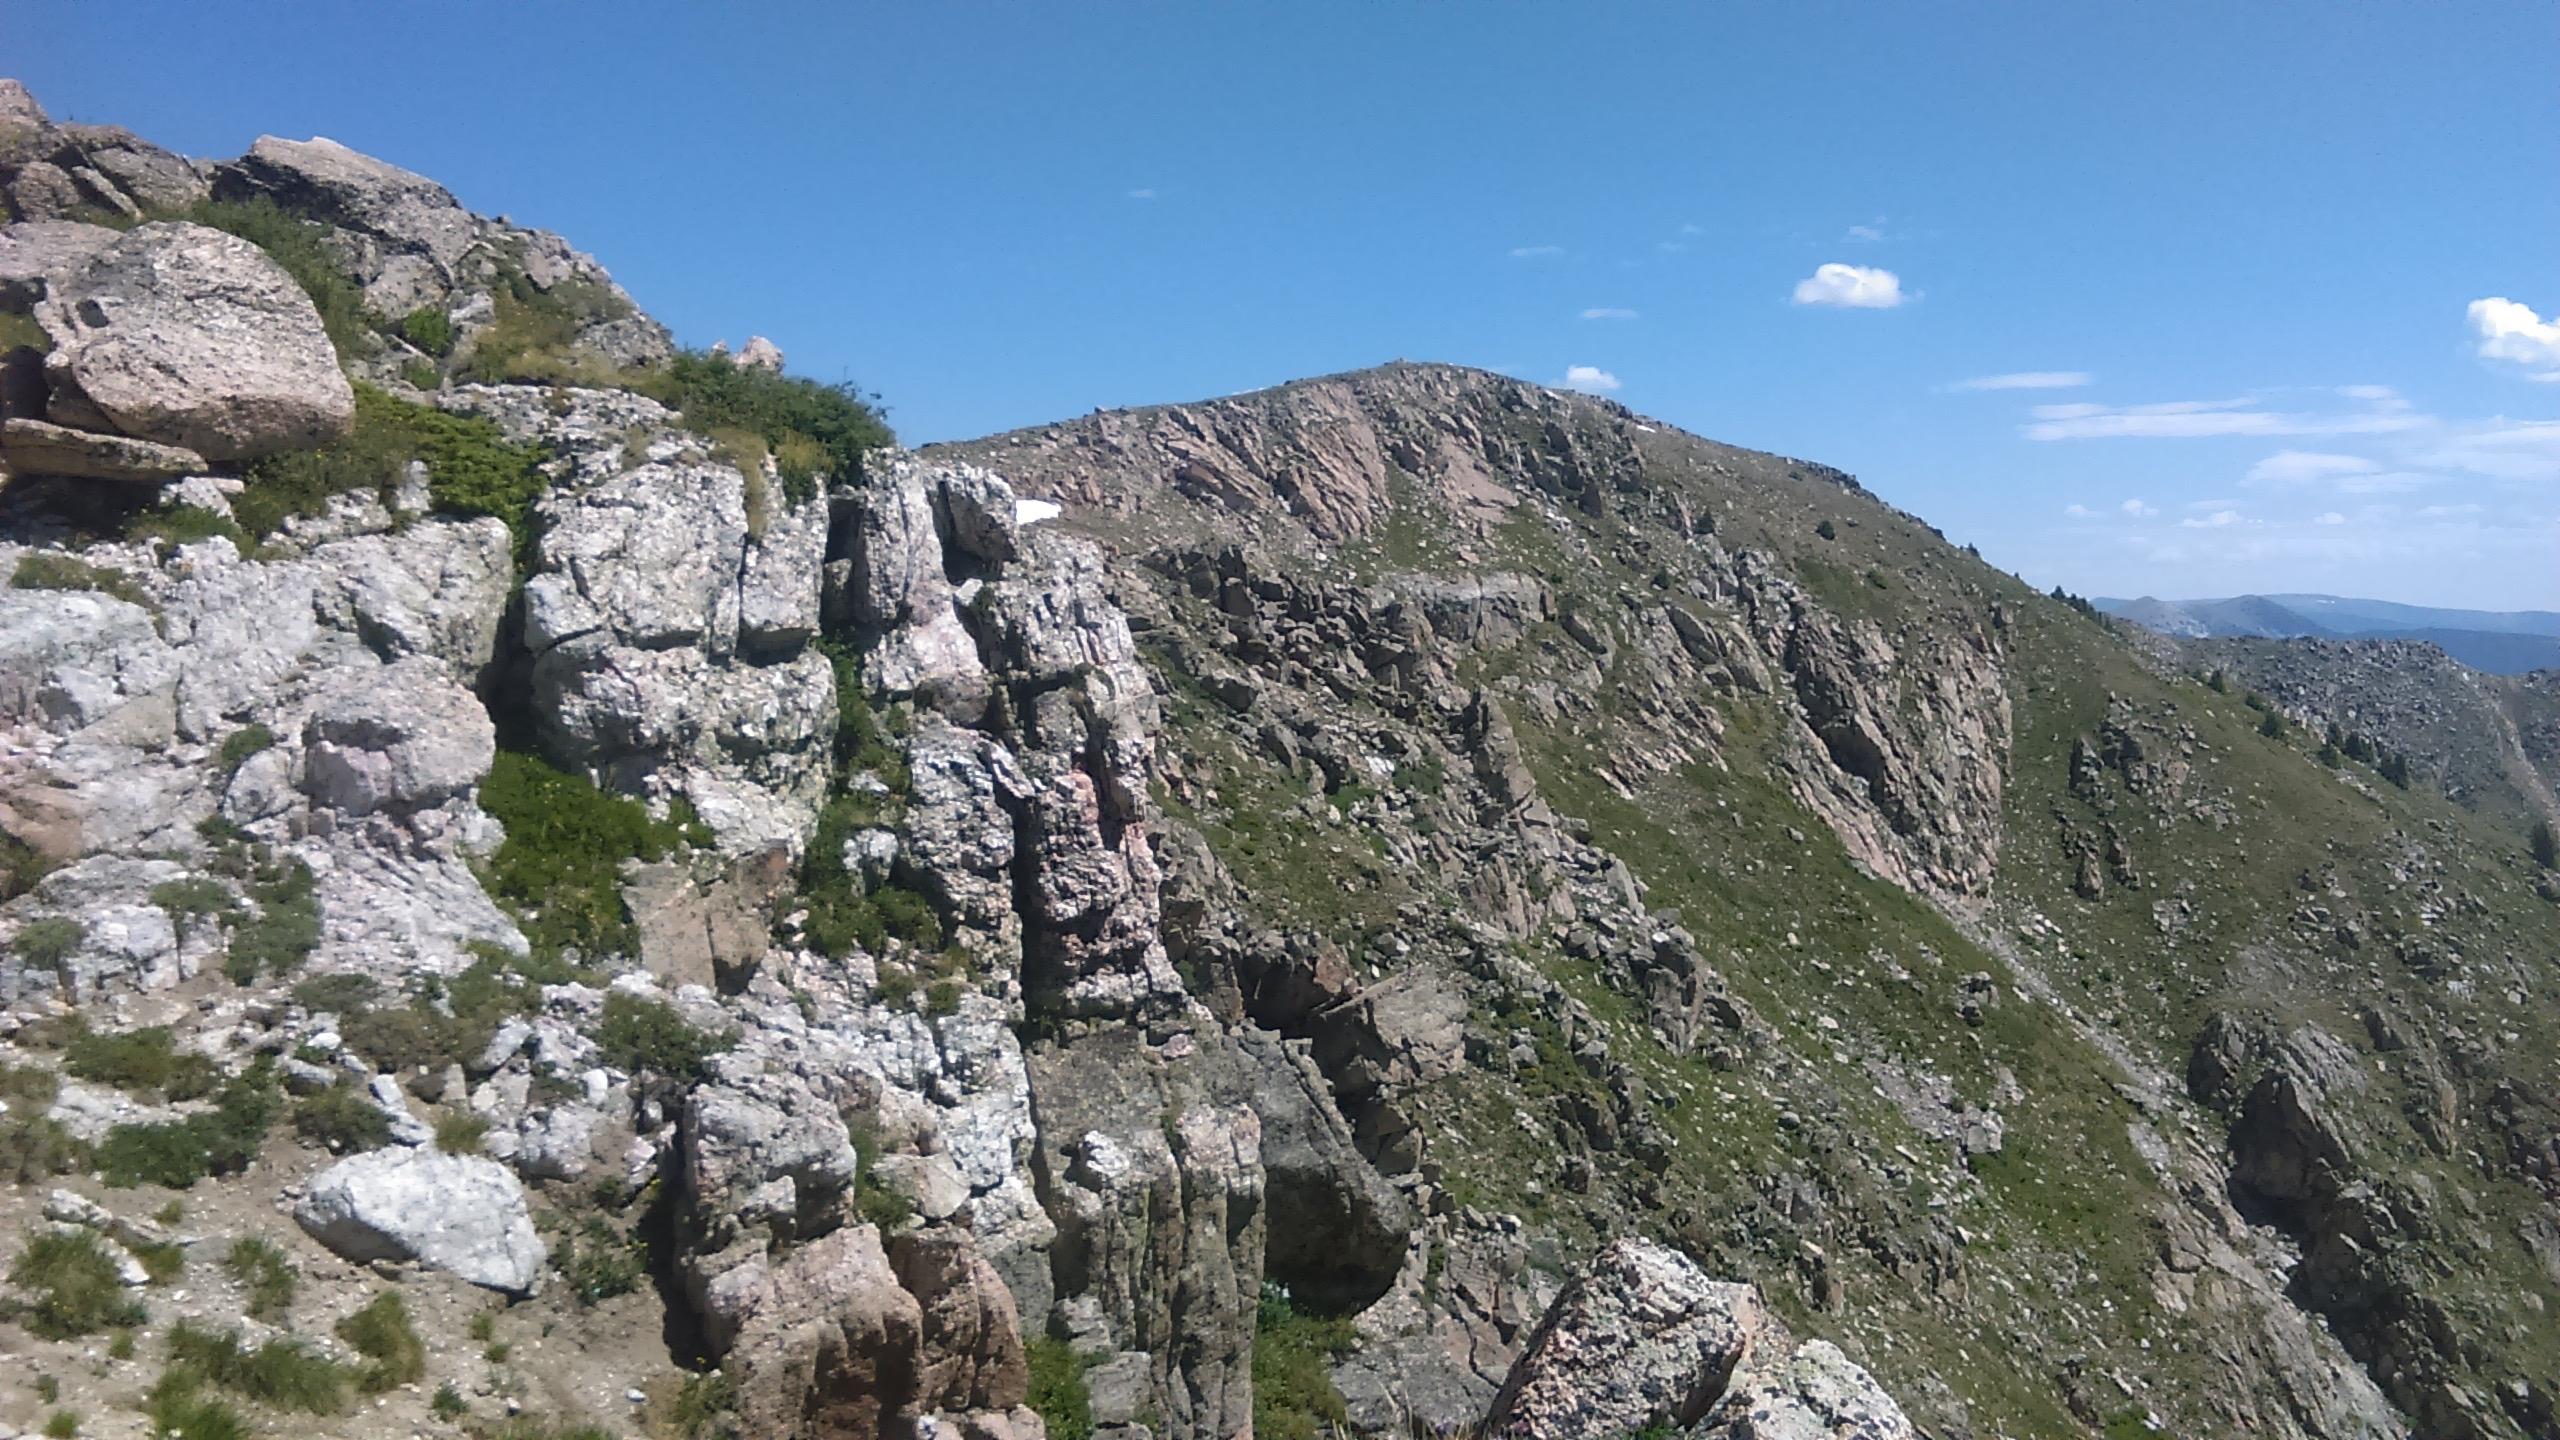 08 Ridge at top of Santa Fe Baldy